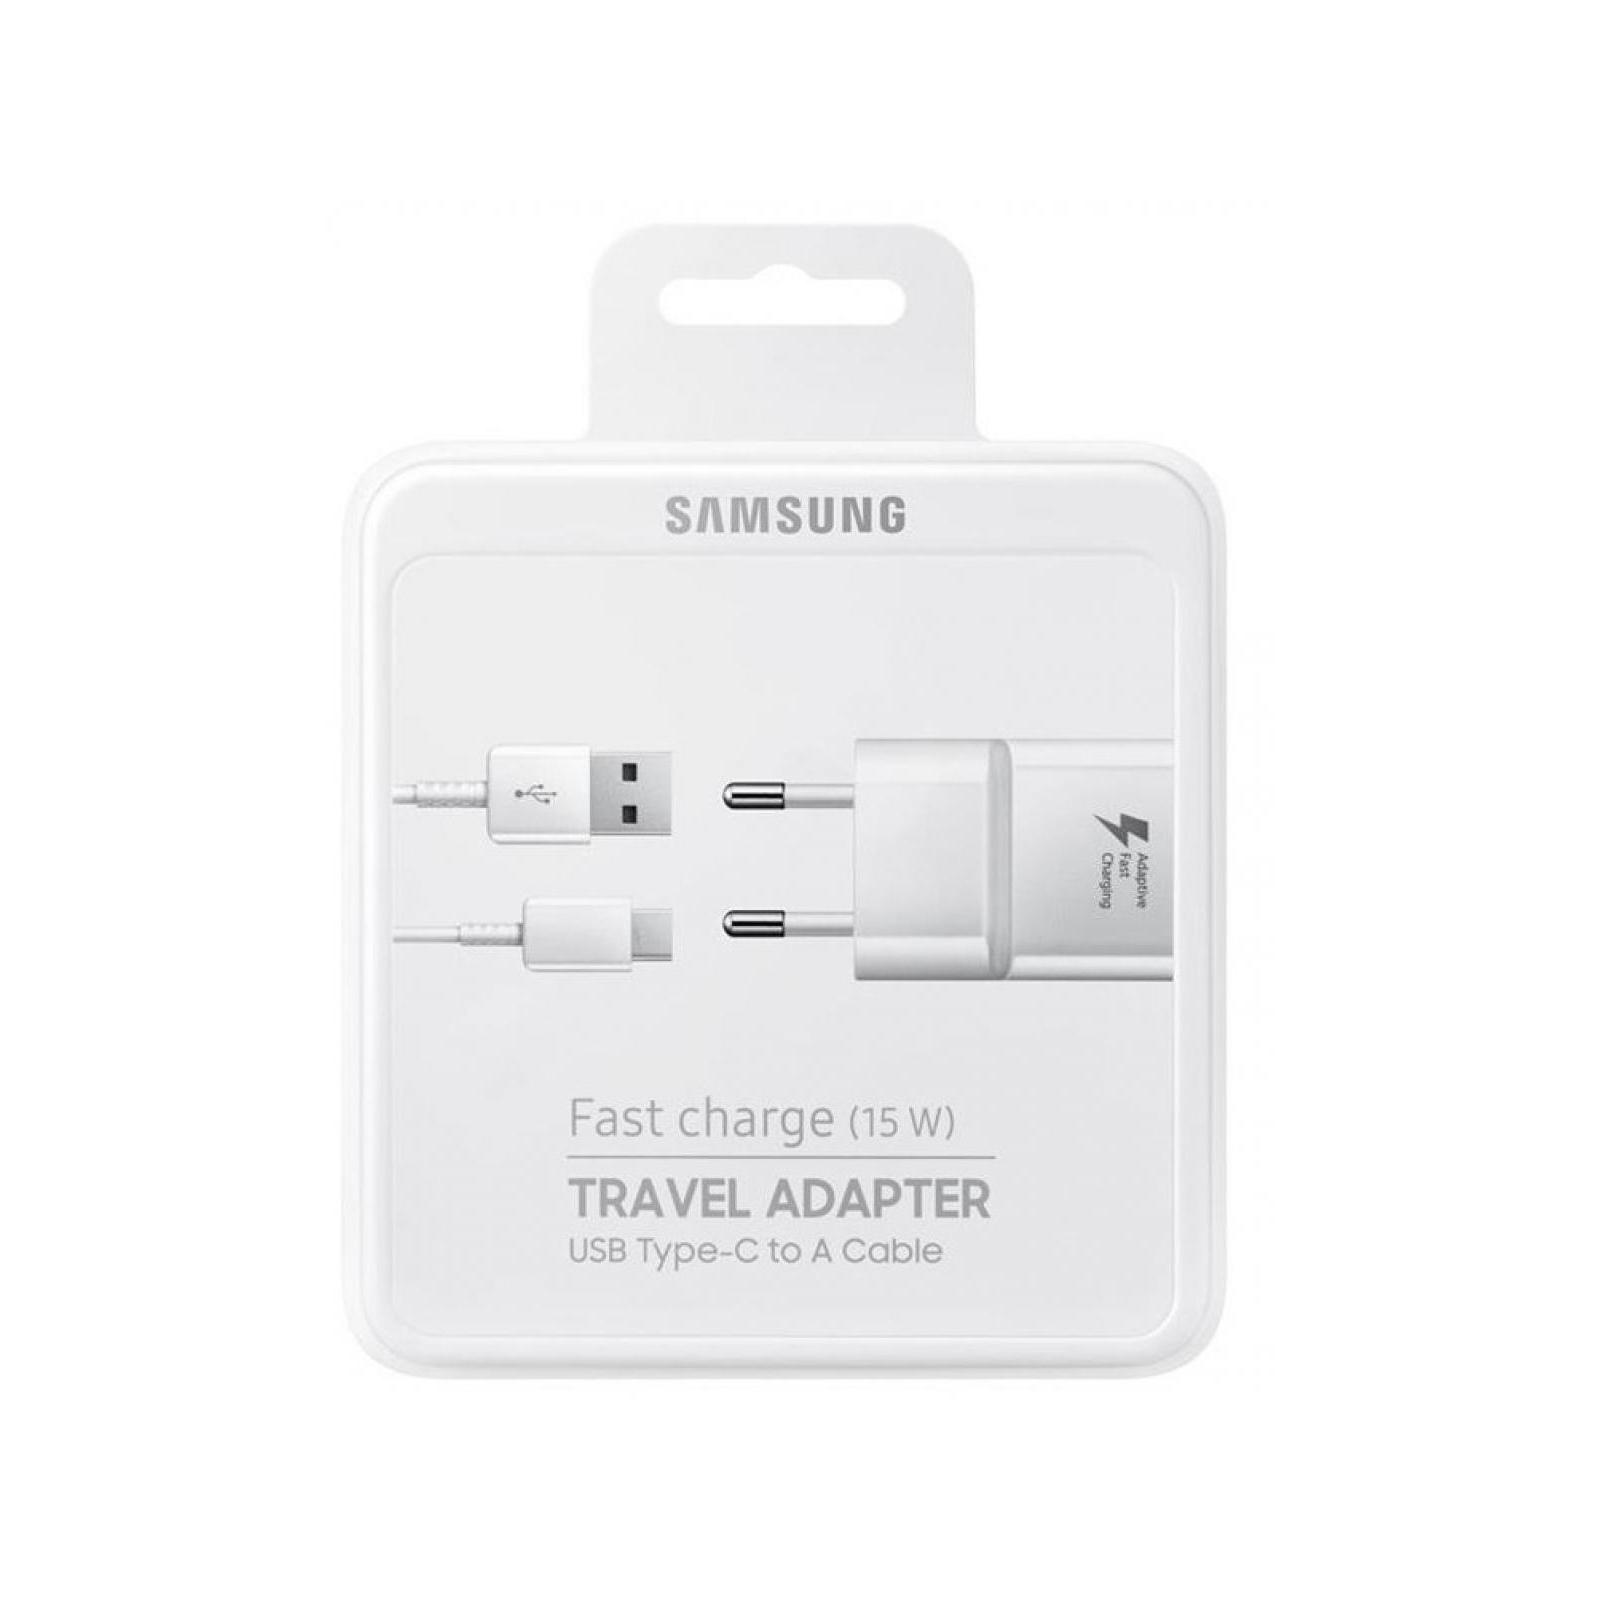 Зарядное устройство Samsung 2A + Type-C Cable (Fast Charging) White (EP-TA20EWECGRU) изображение 5